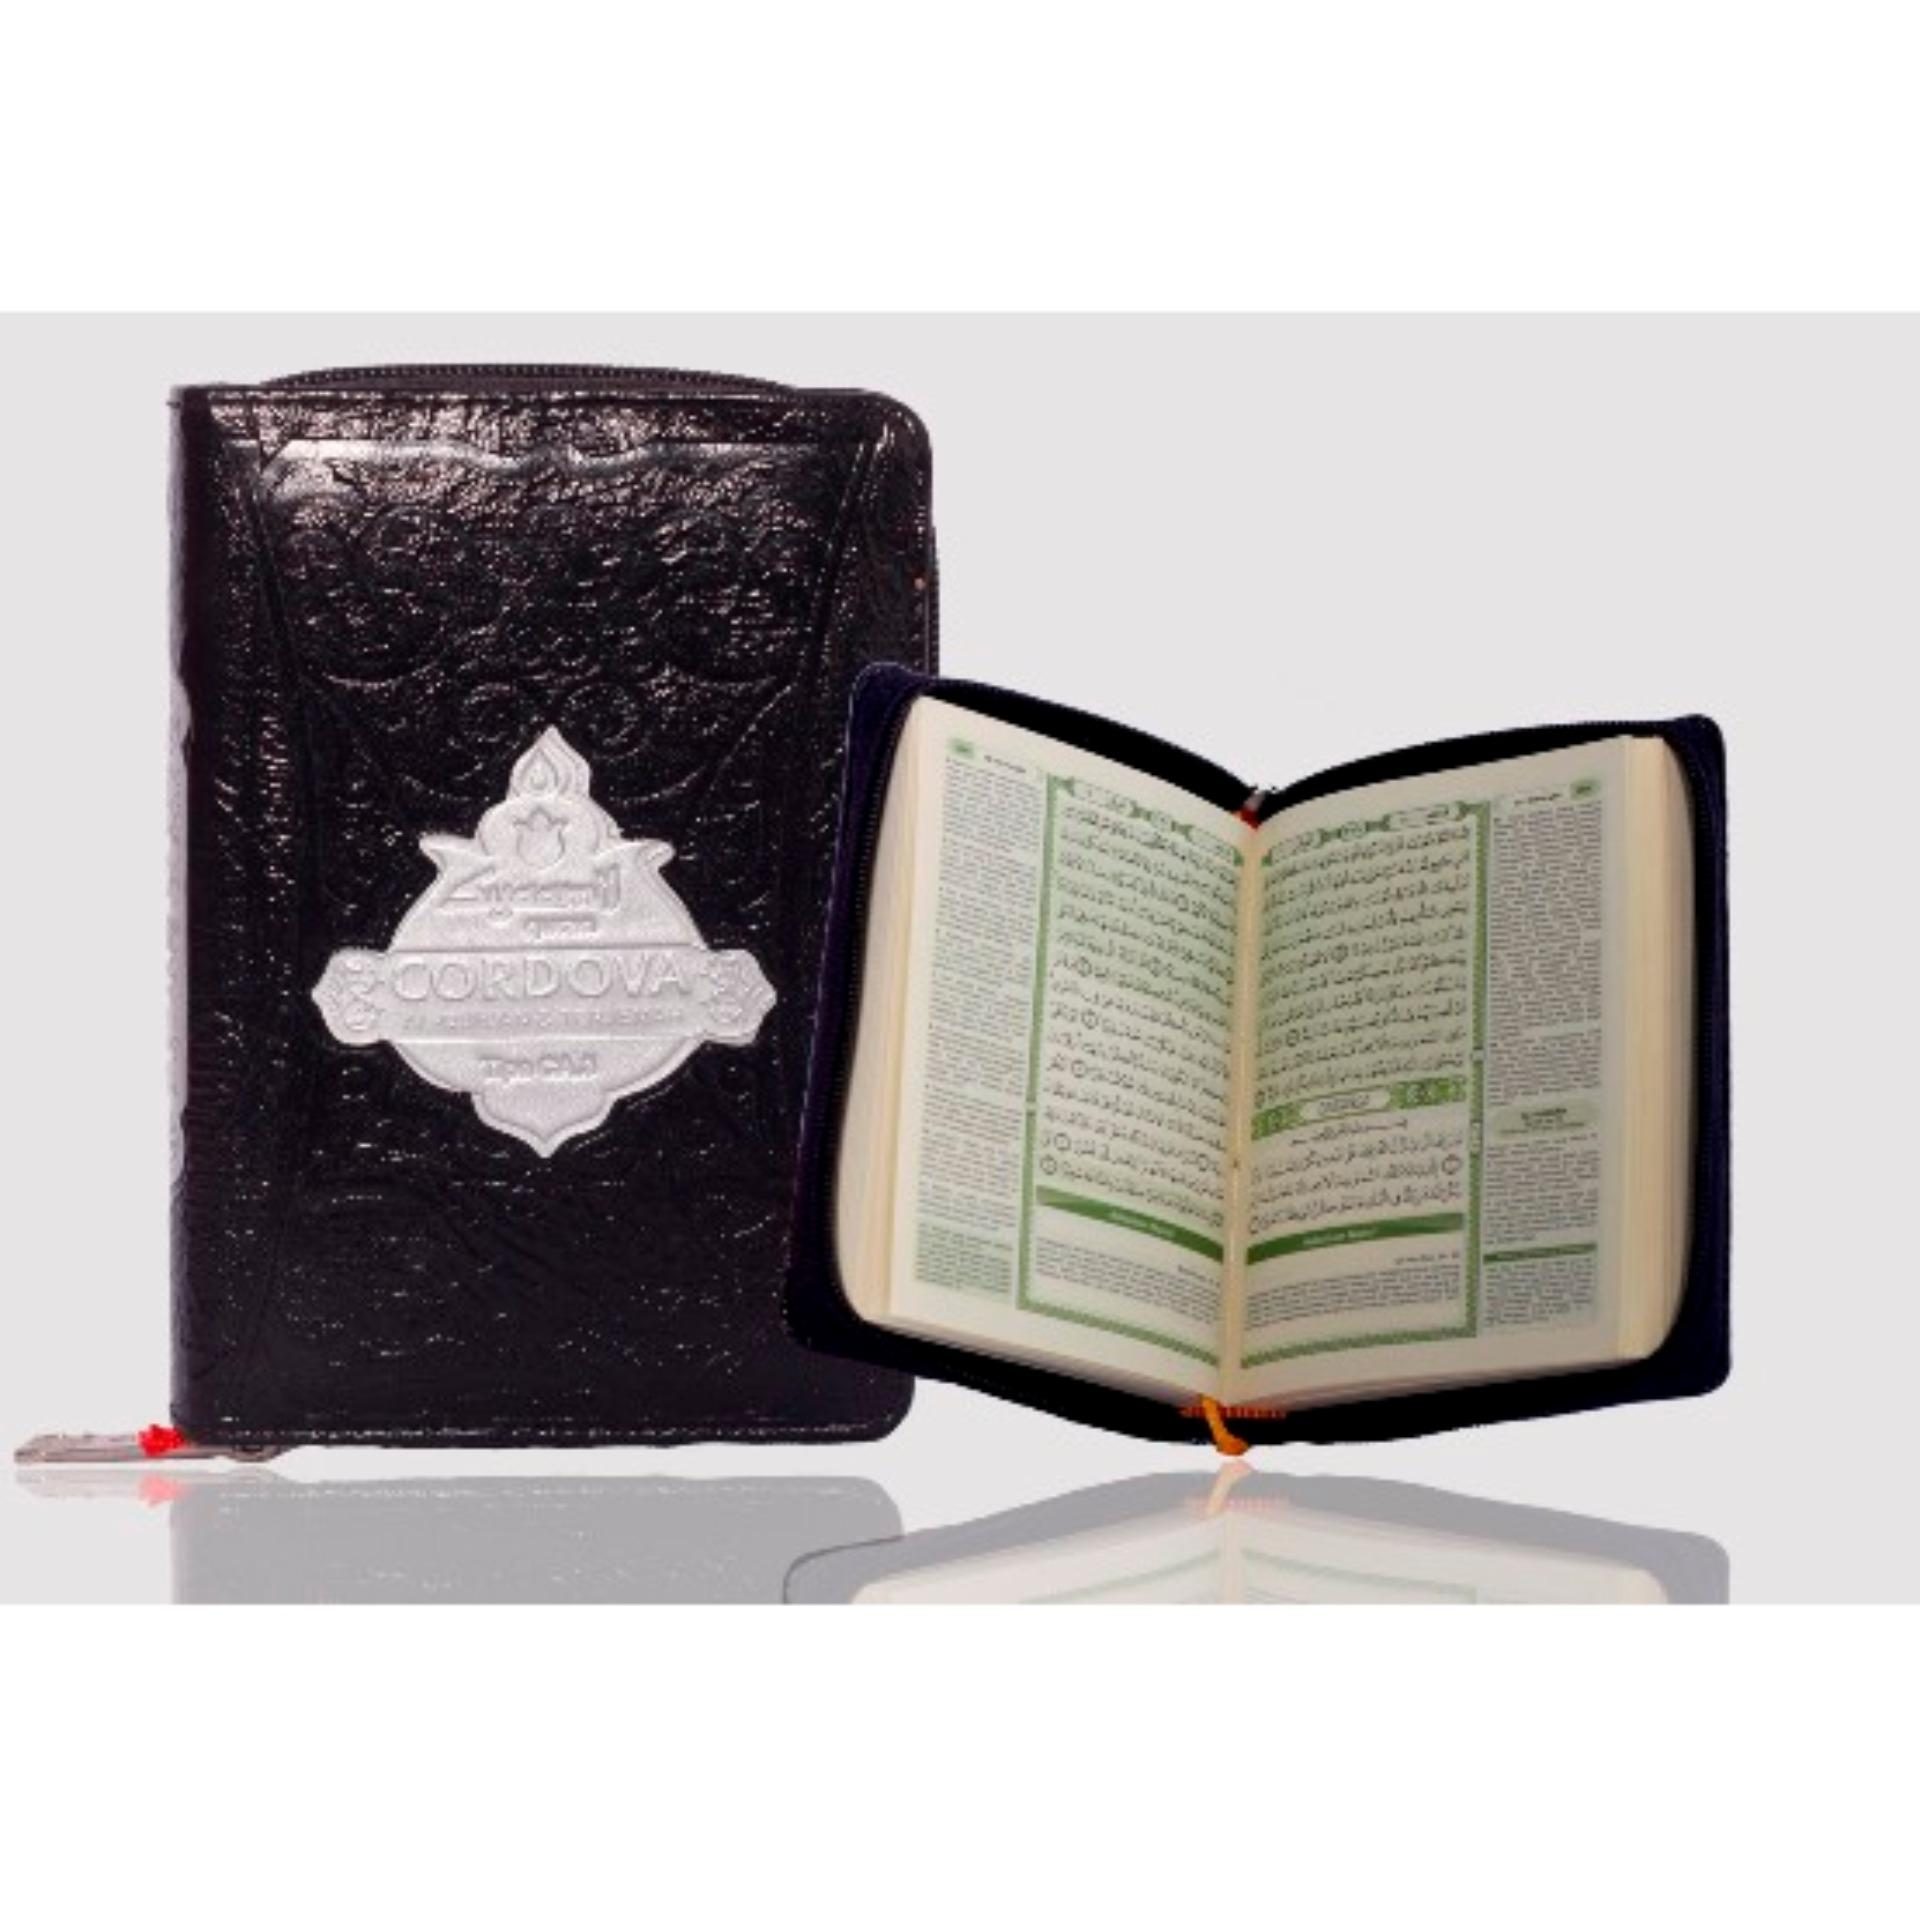 Spesifikasi Syaamil Al Quran Terjemah Syaamil Cordova Resleting A6 Terbaik